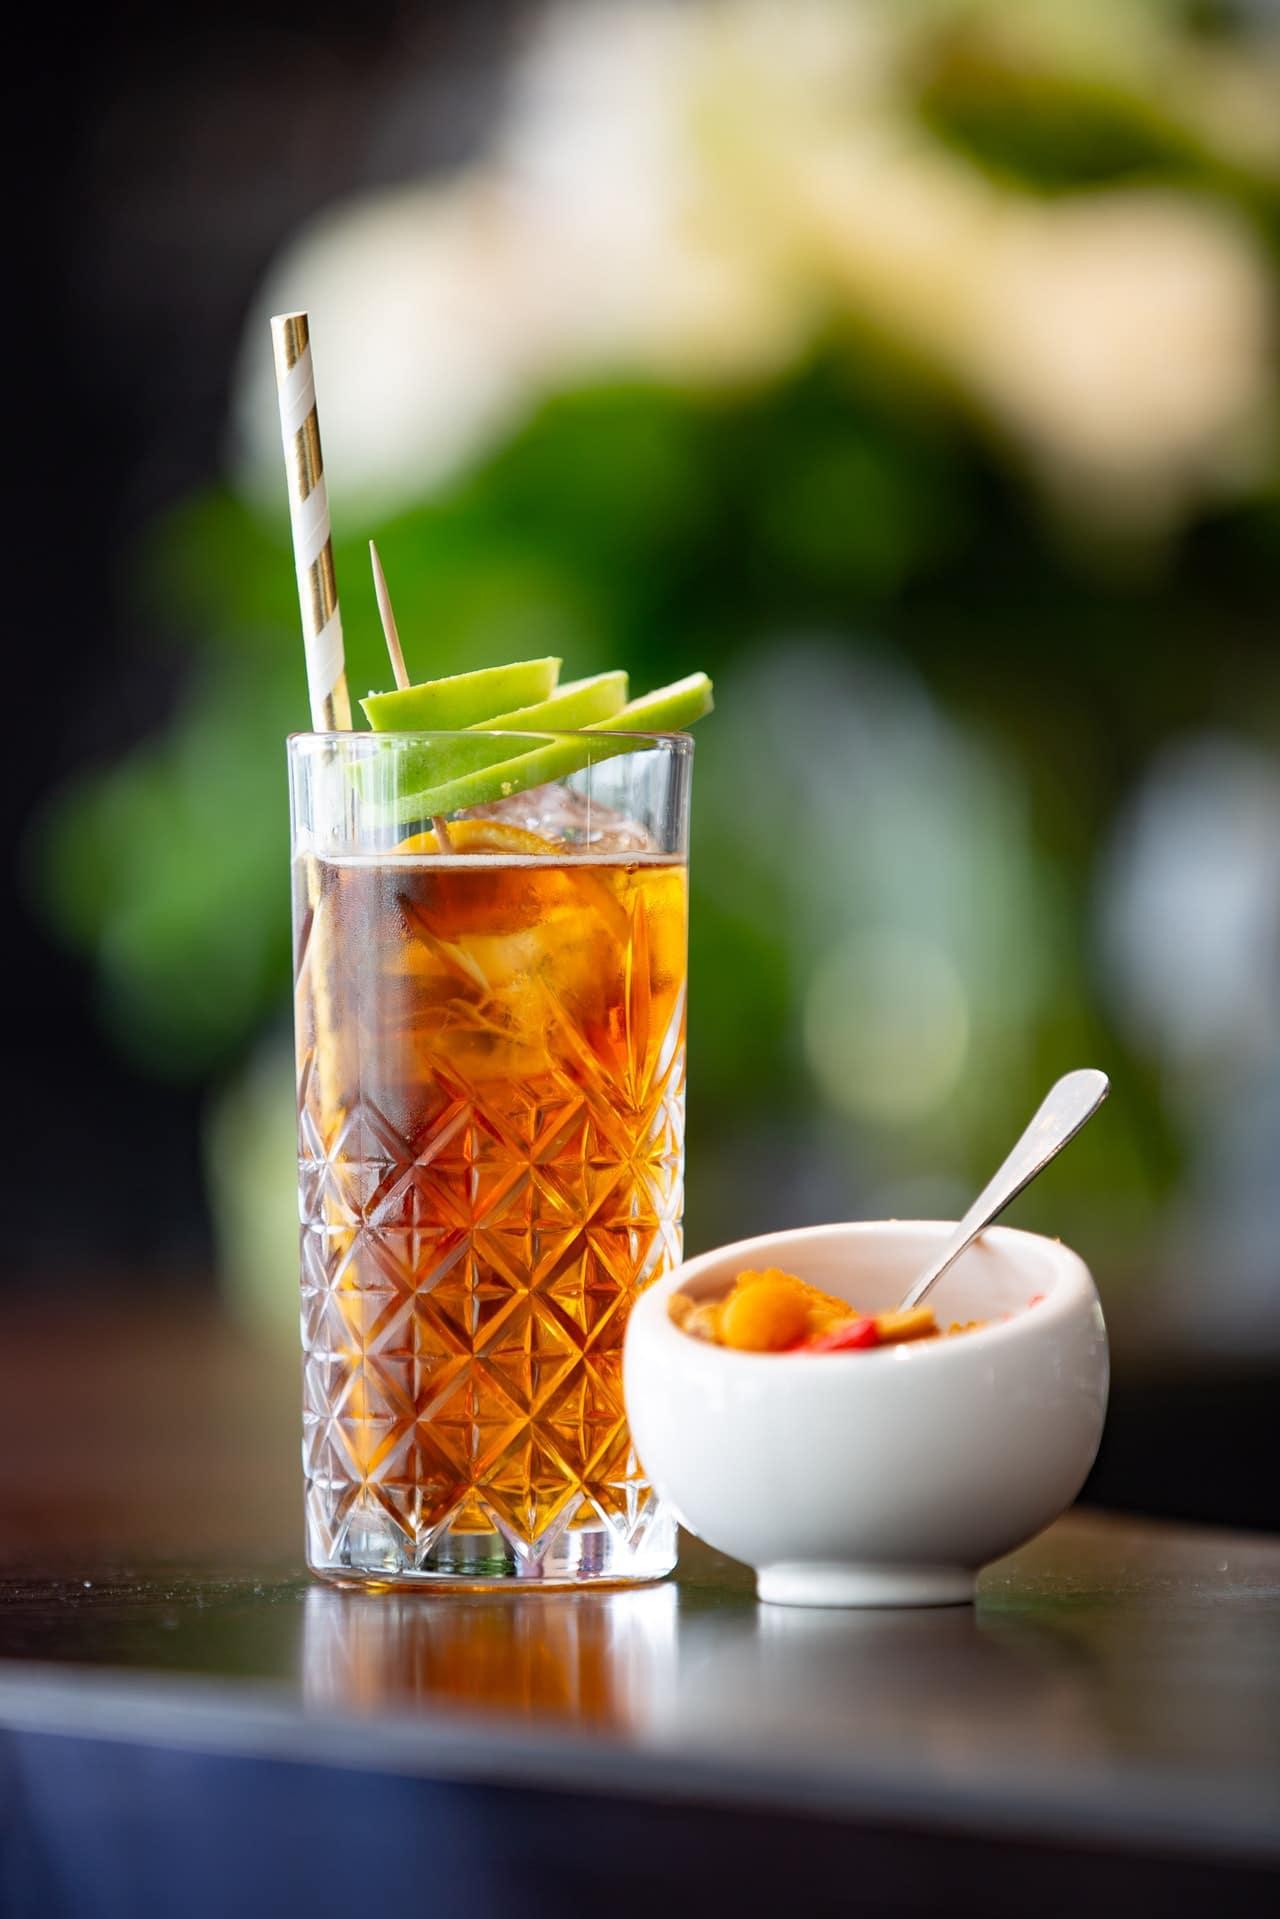 easy alcoholic drinks to make at home-long island ice tea